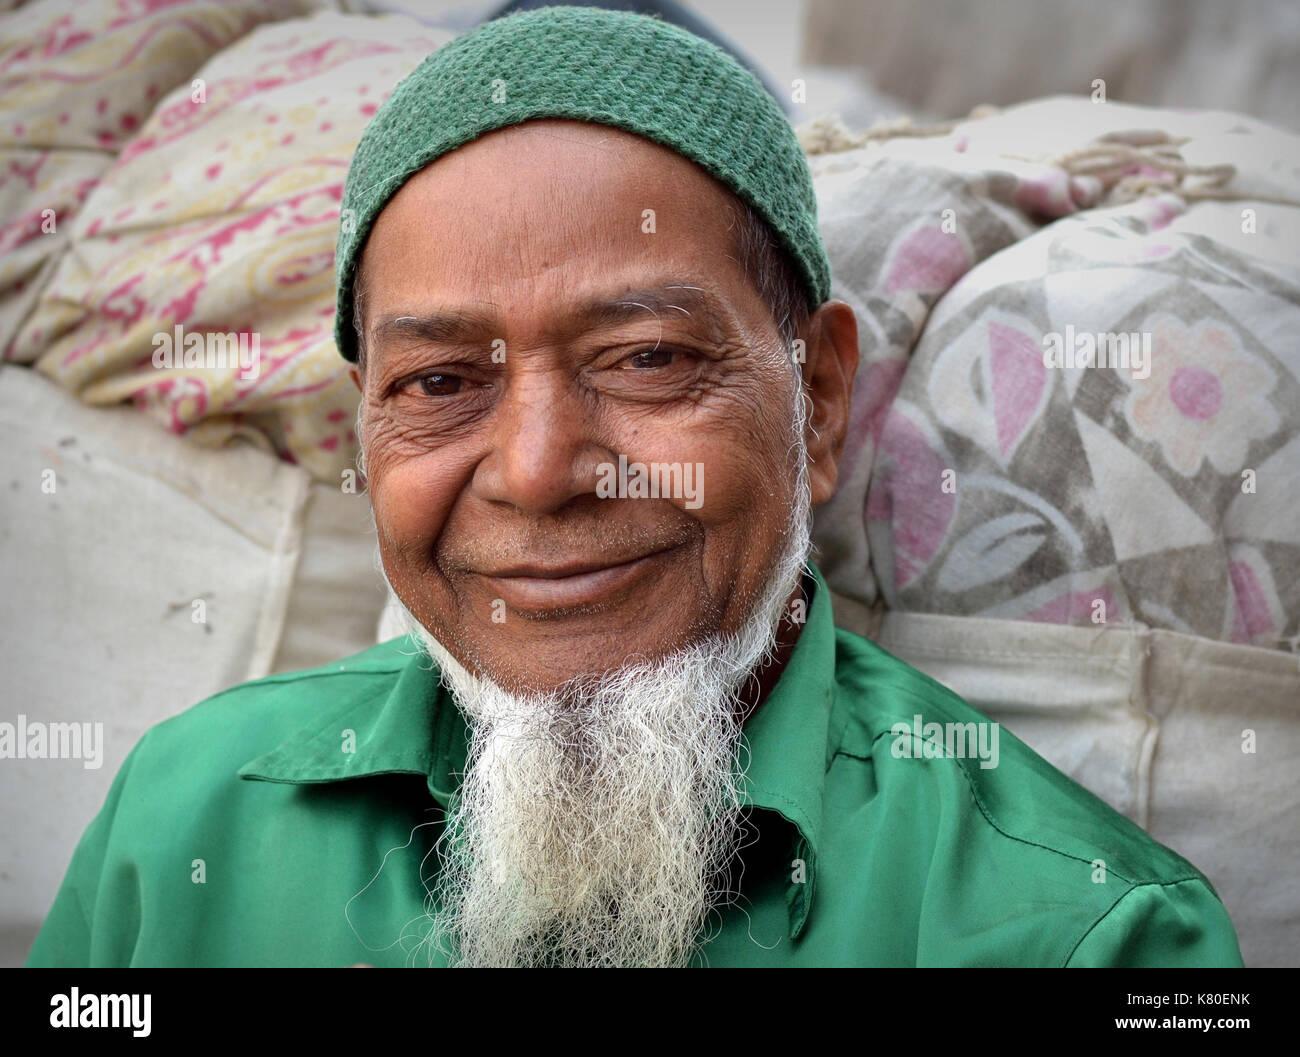 Elderly Indian Muslim man with white Muslim chin beard, wearing a green shirt and a knitted green Muslim prayer cap (taqiyah) - Stock Image